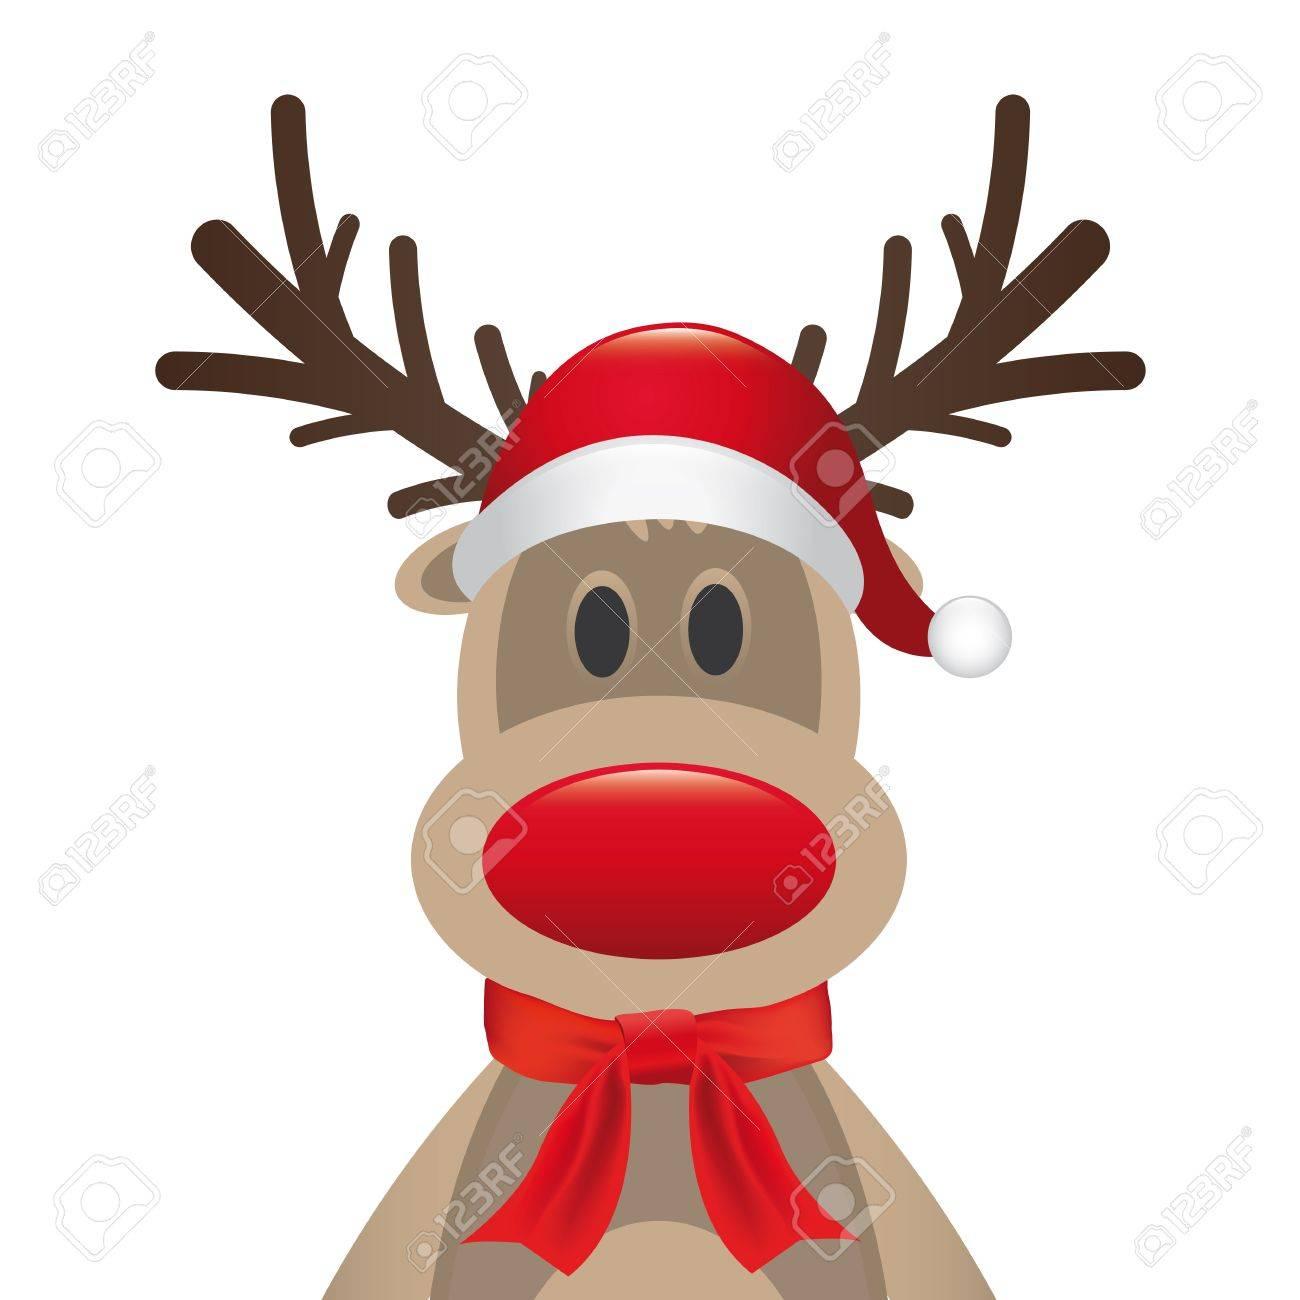 de25cd7b89281 rudolph reindeer red nose santa hat scarf Stock Photo - 15321544